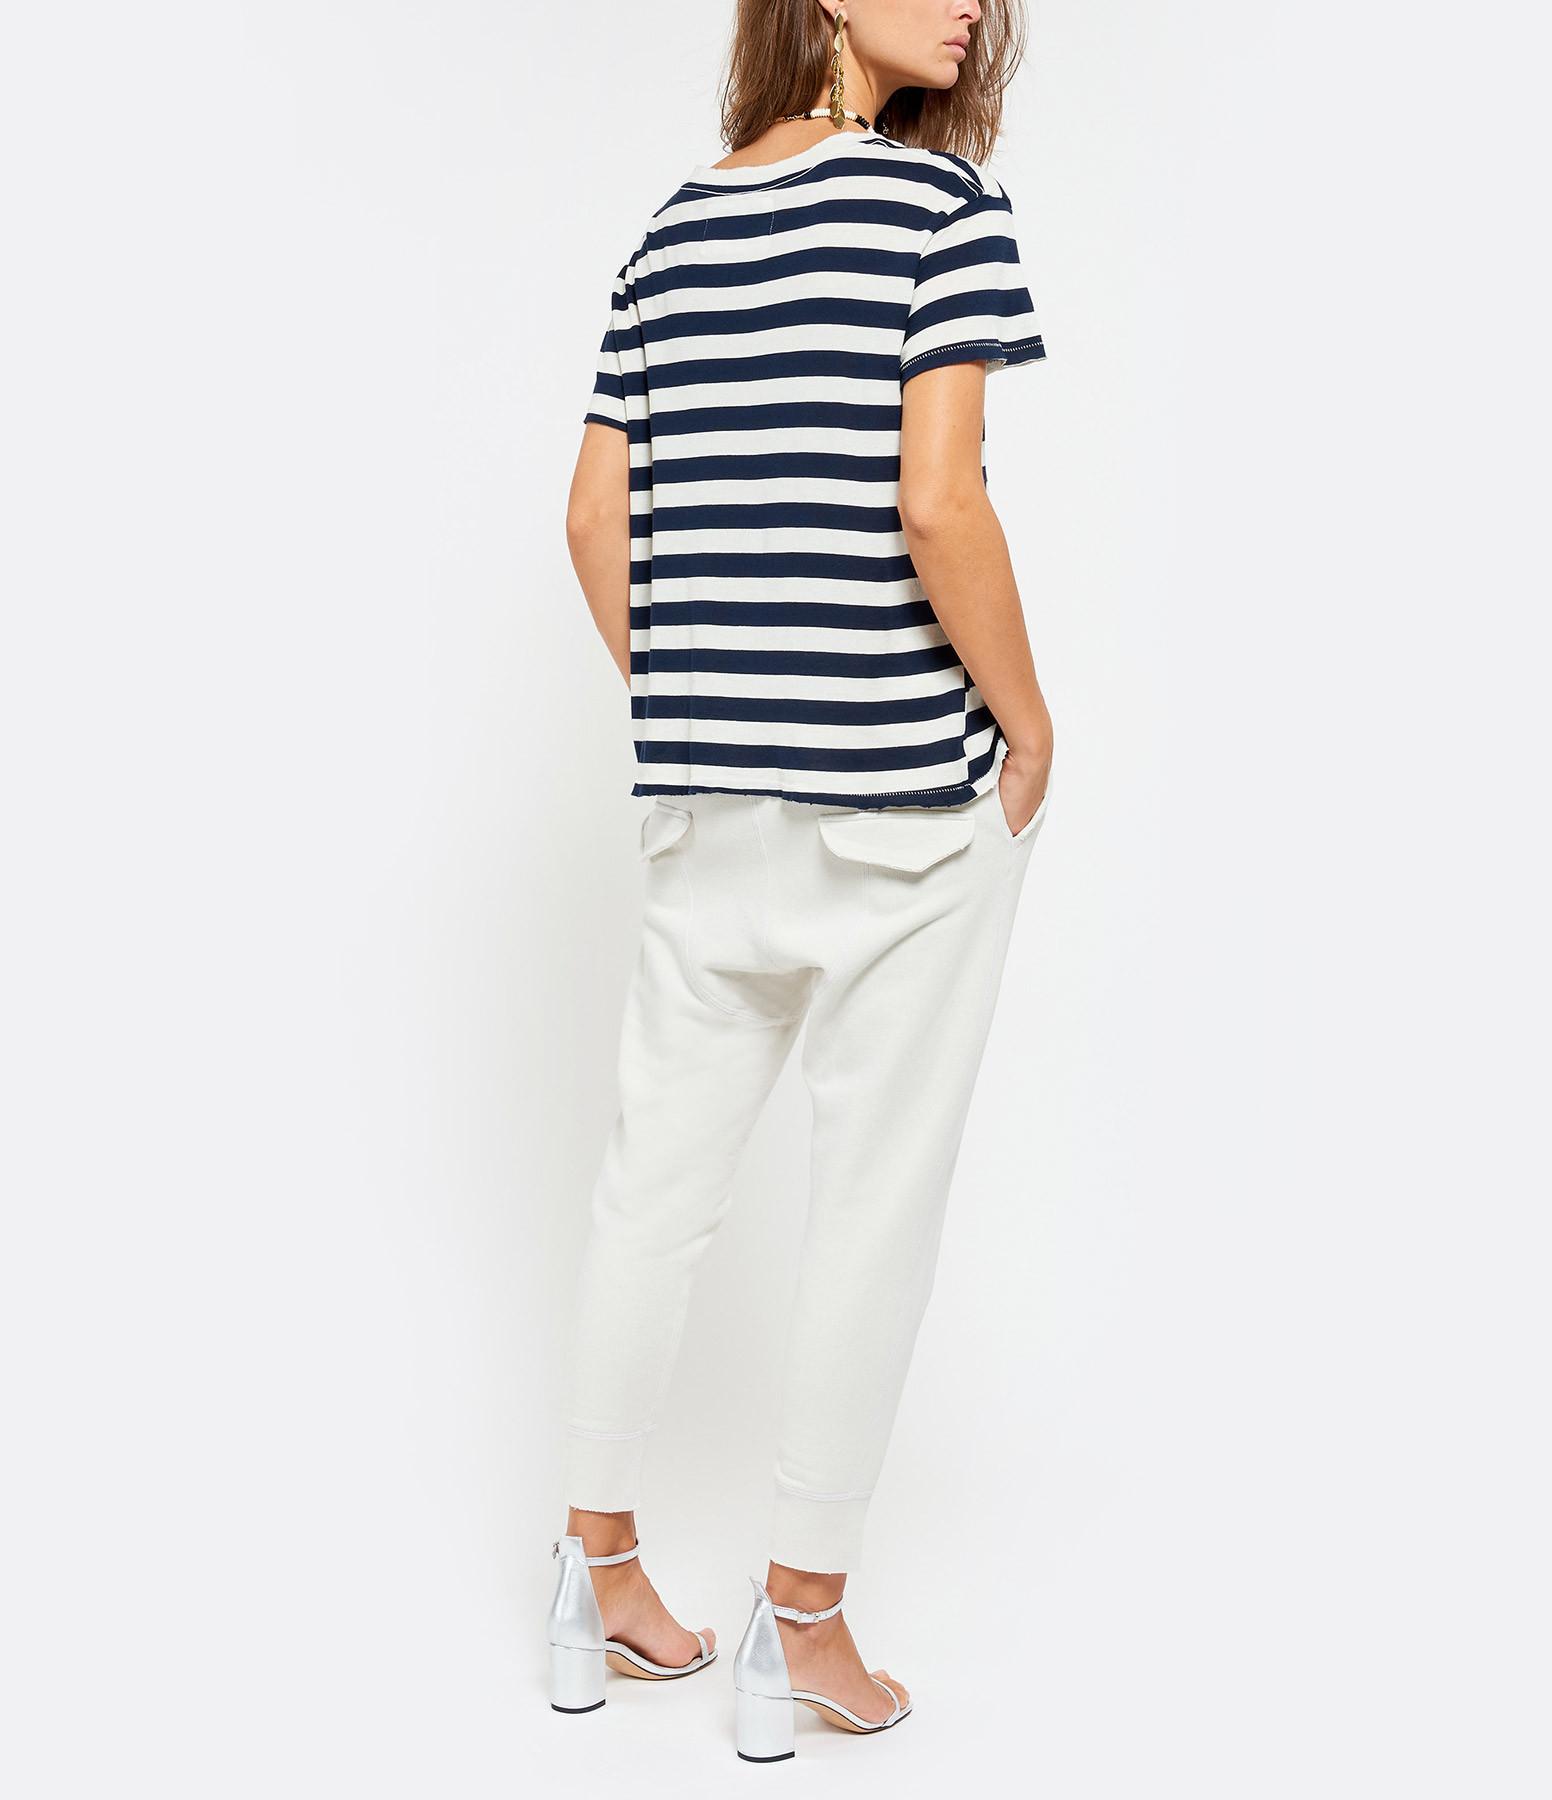 NILI LOTAN - Tee-shirt Brady Navy Foncé